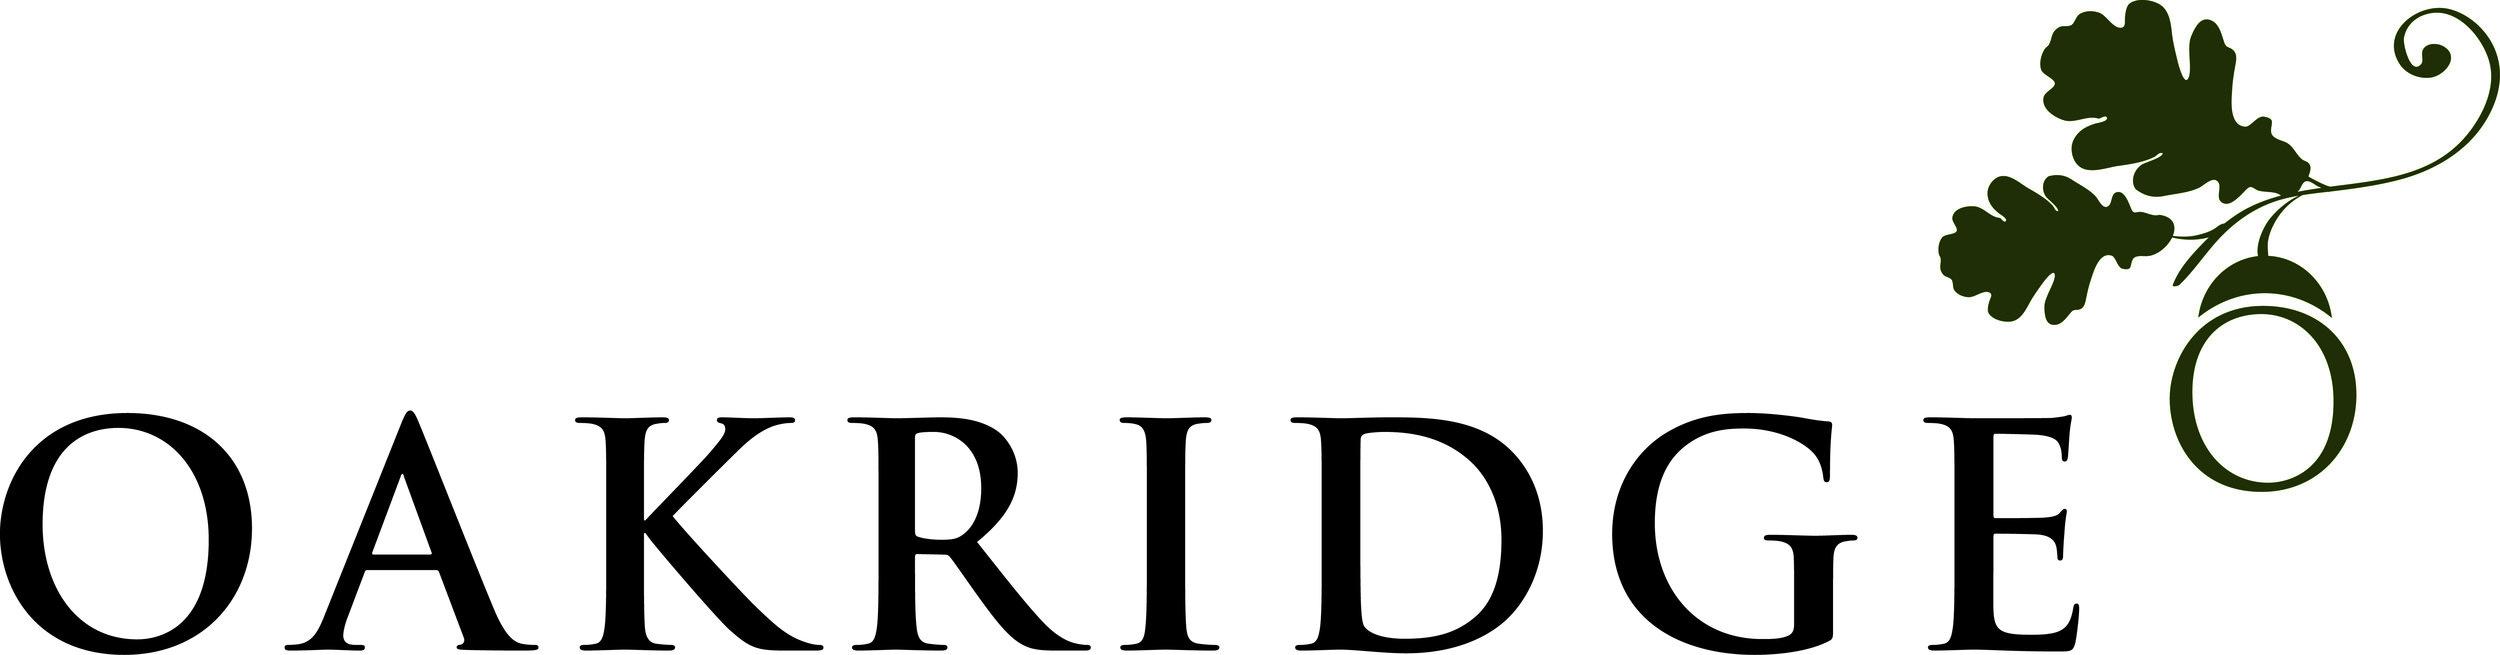 Oakridge Logo High Res 2015_2.jpg